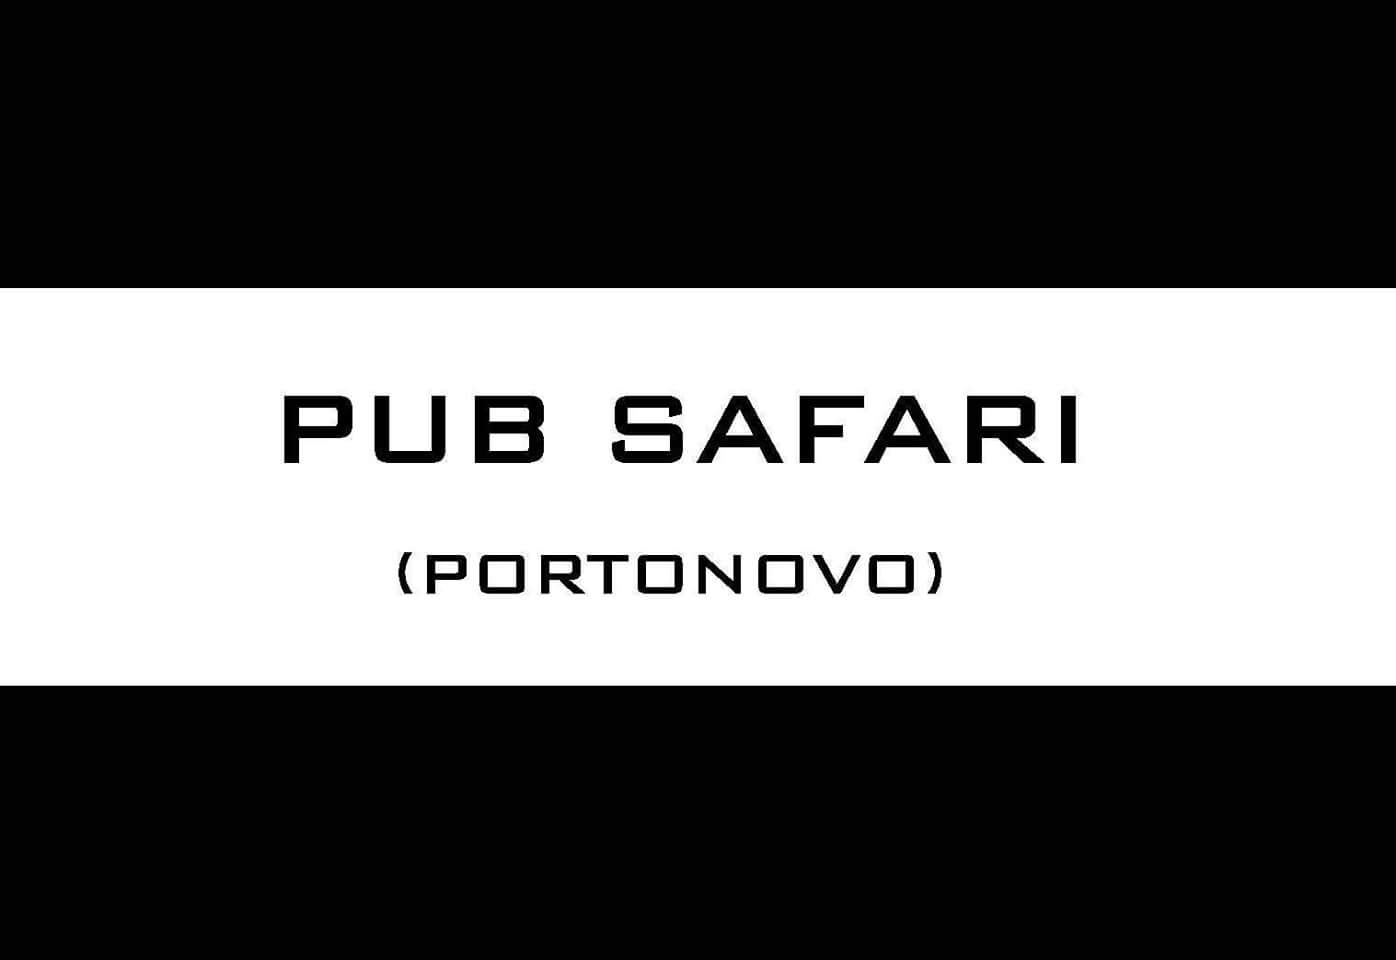 PUB SAFARI